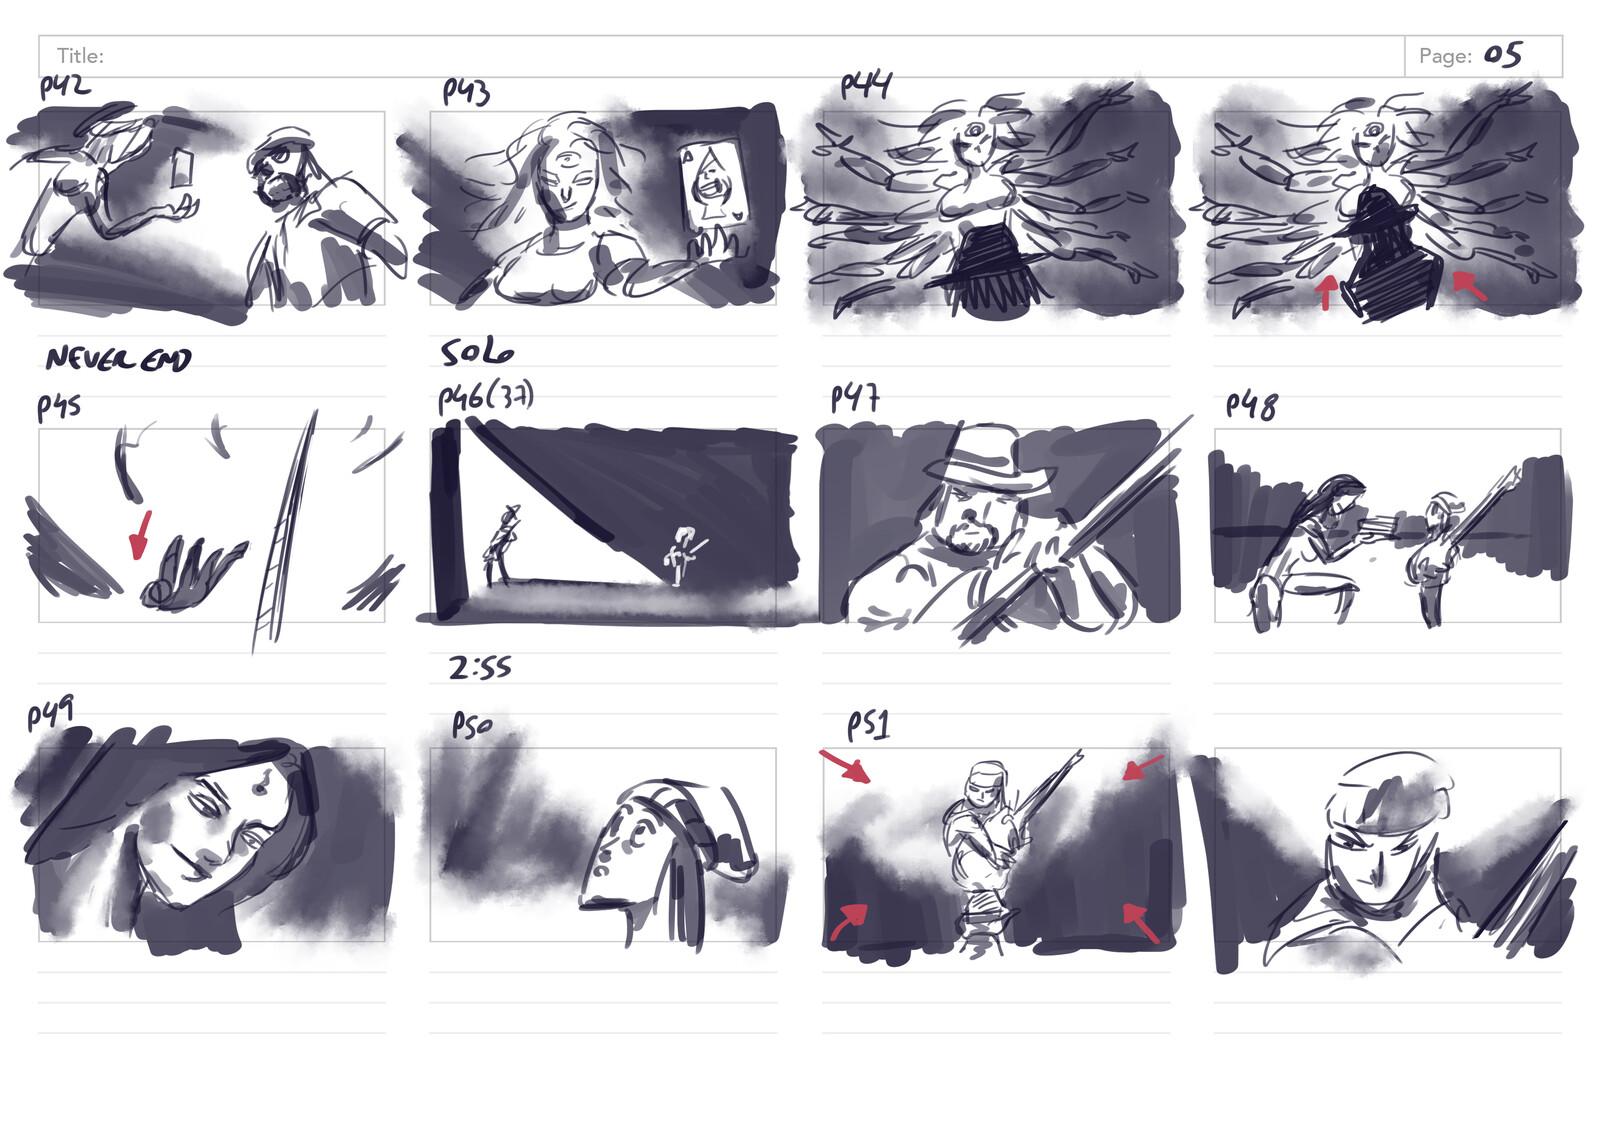 Storyboard 5/6